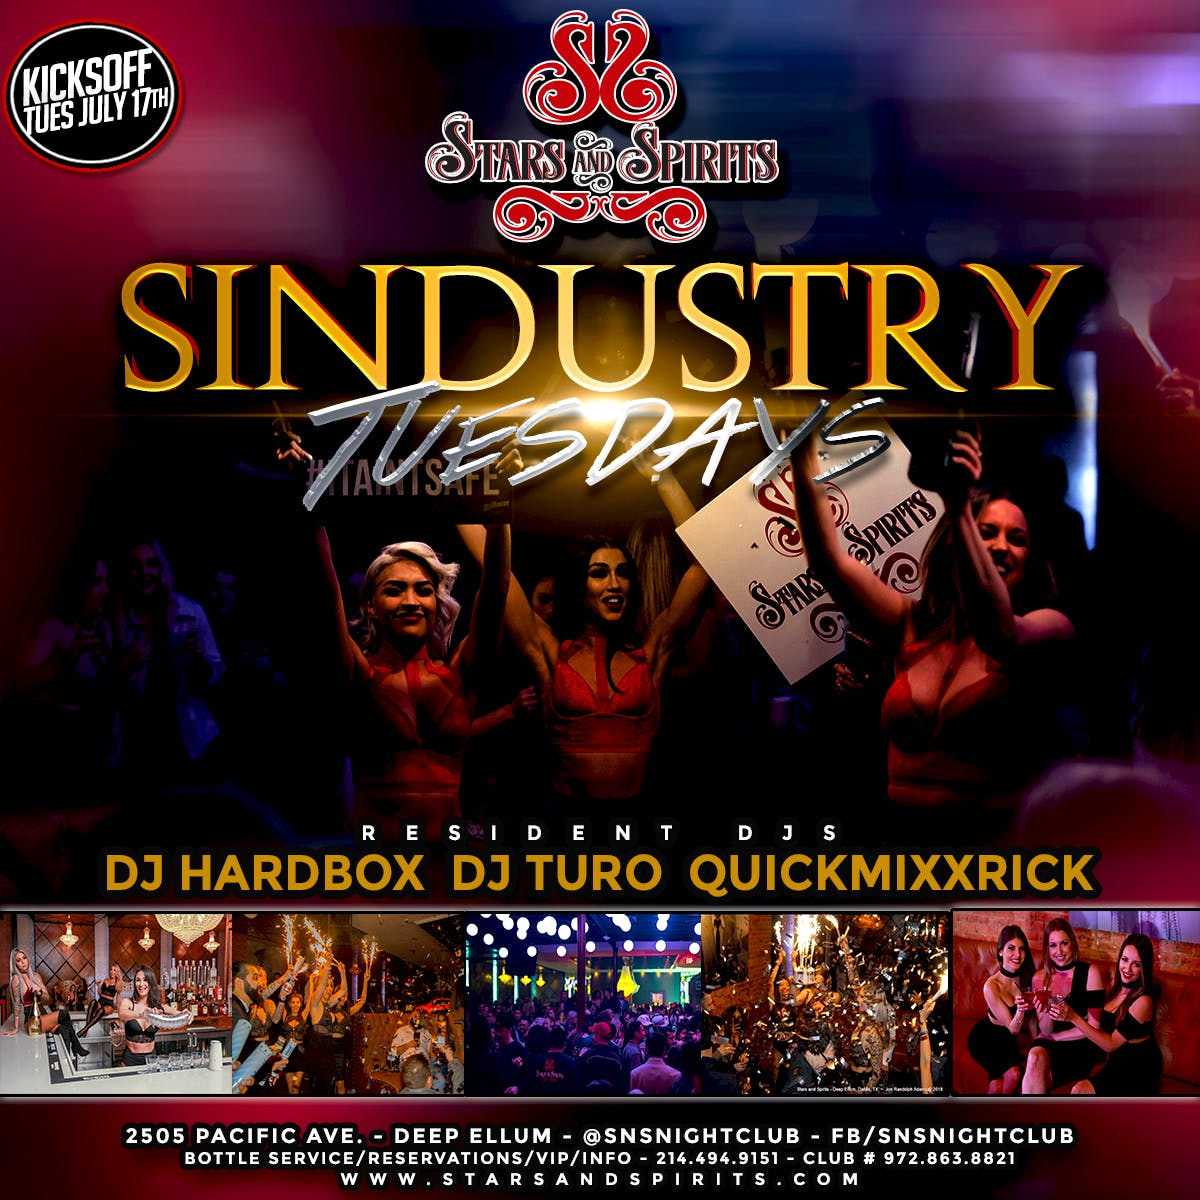 Sindustry Tuesdays at Stars & Spirits